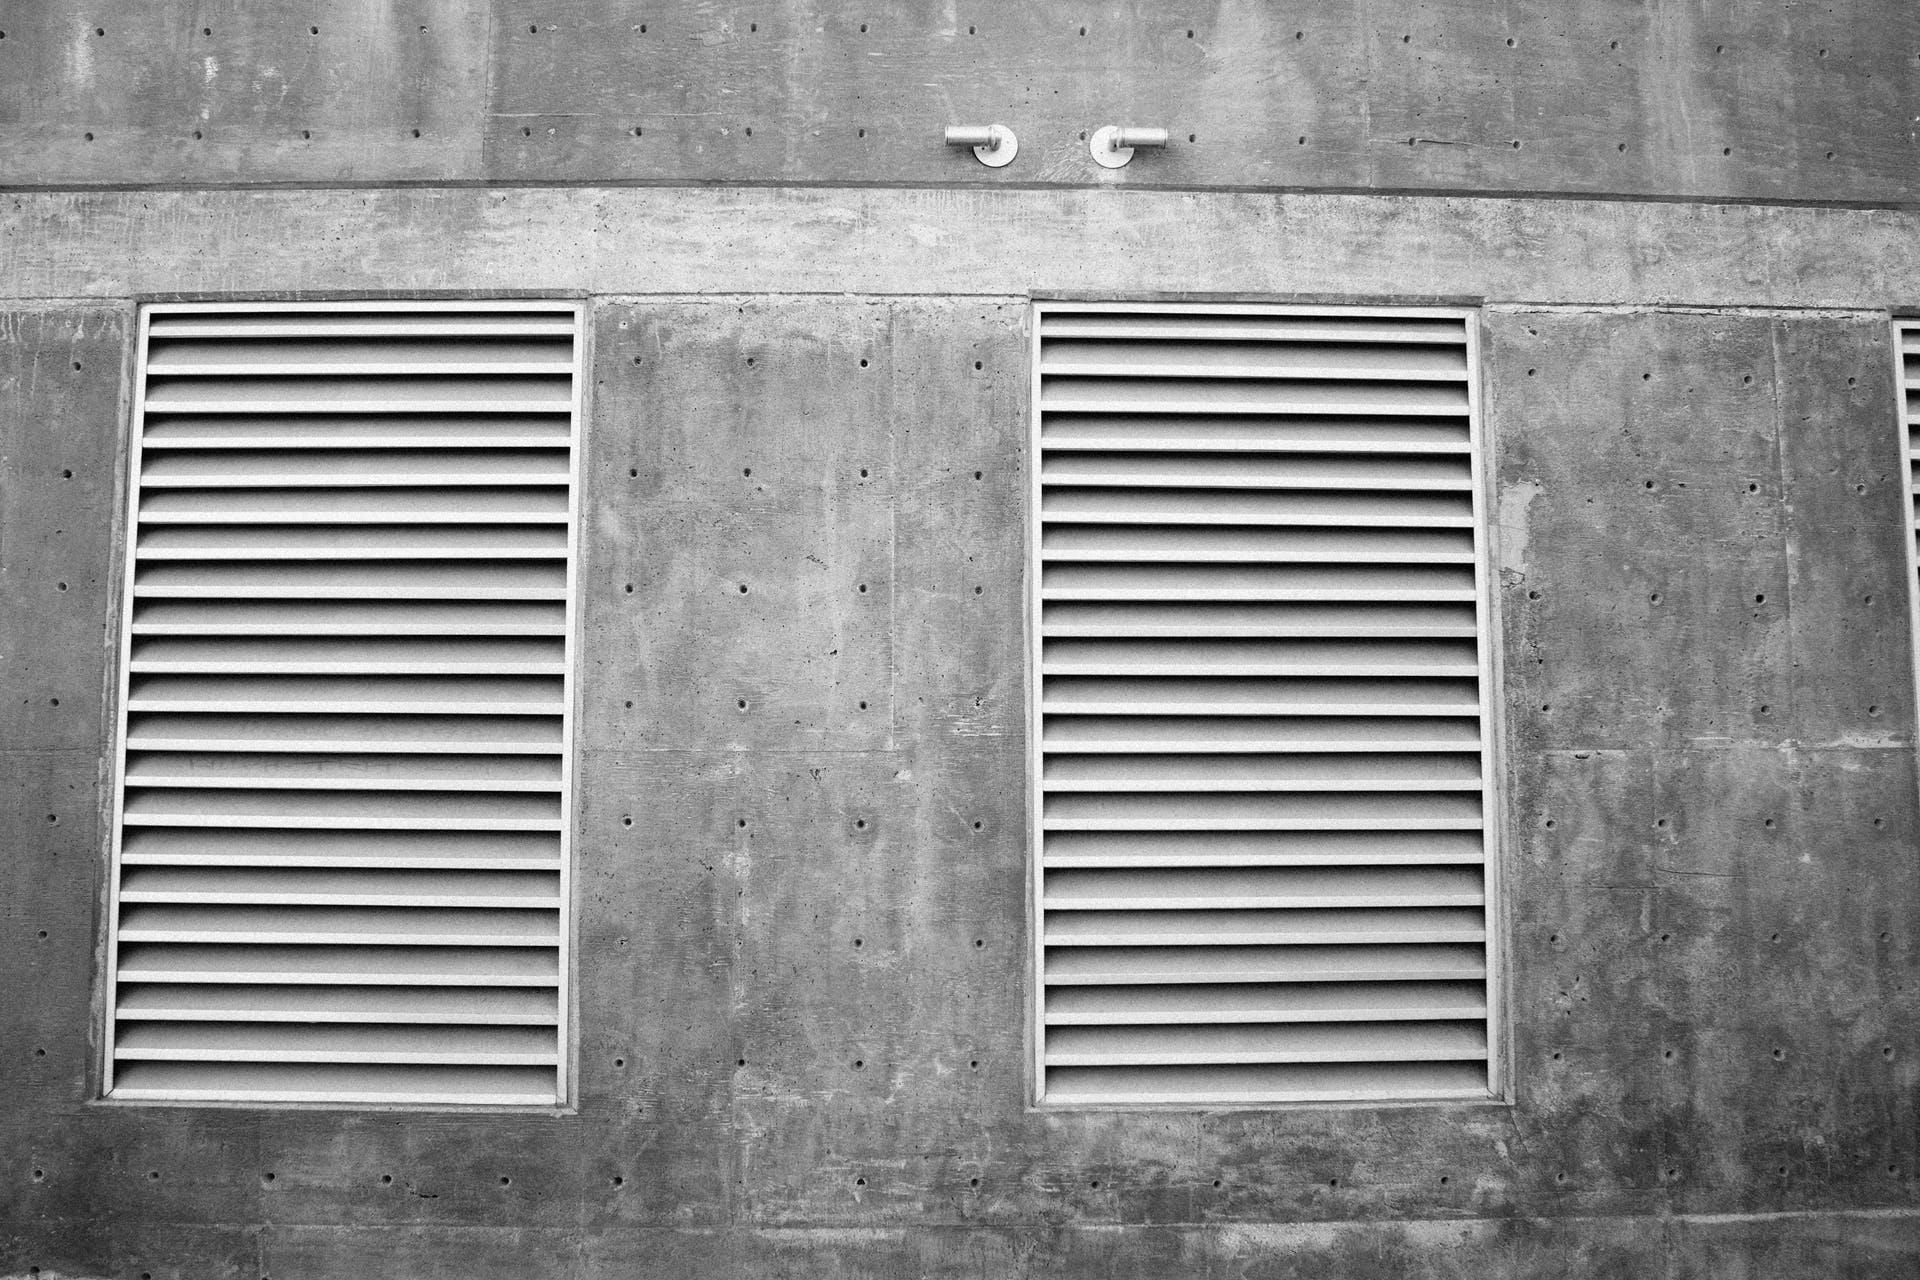 ventilation shaft, ventilator